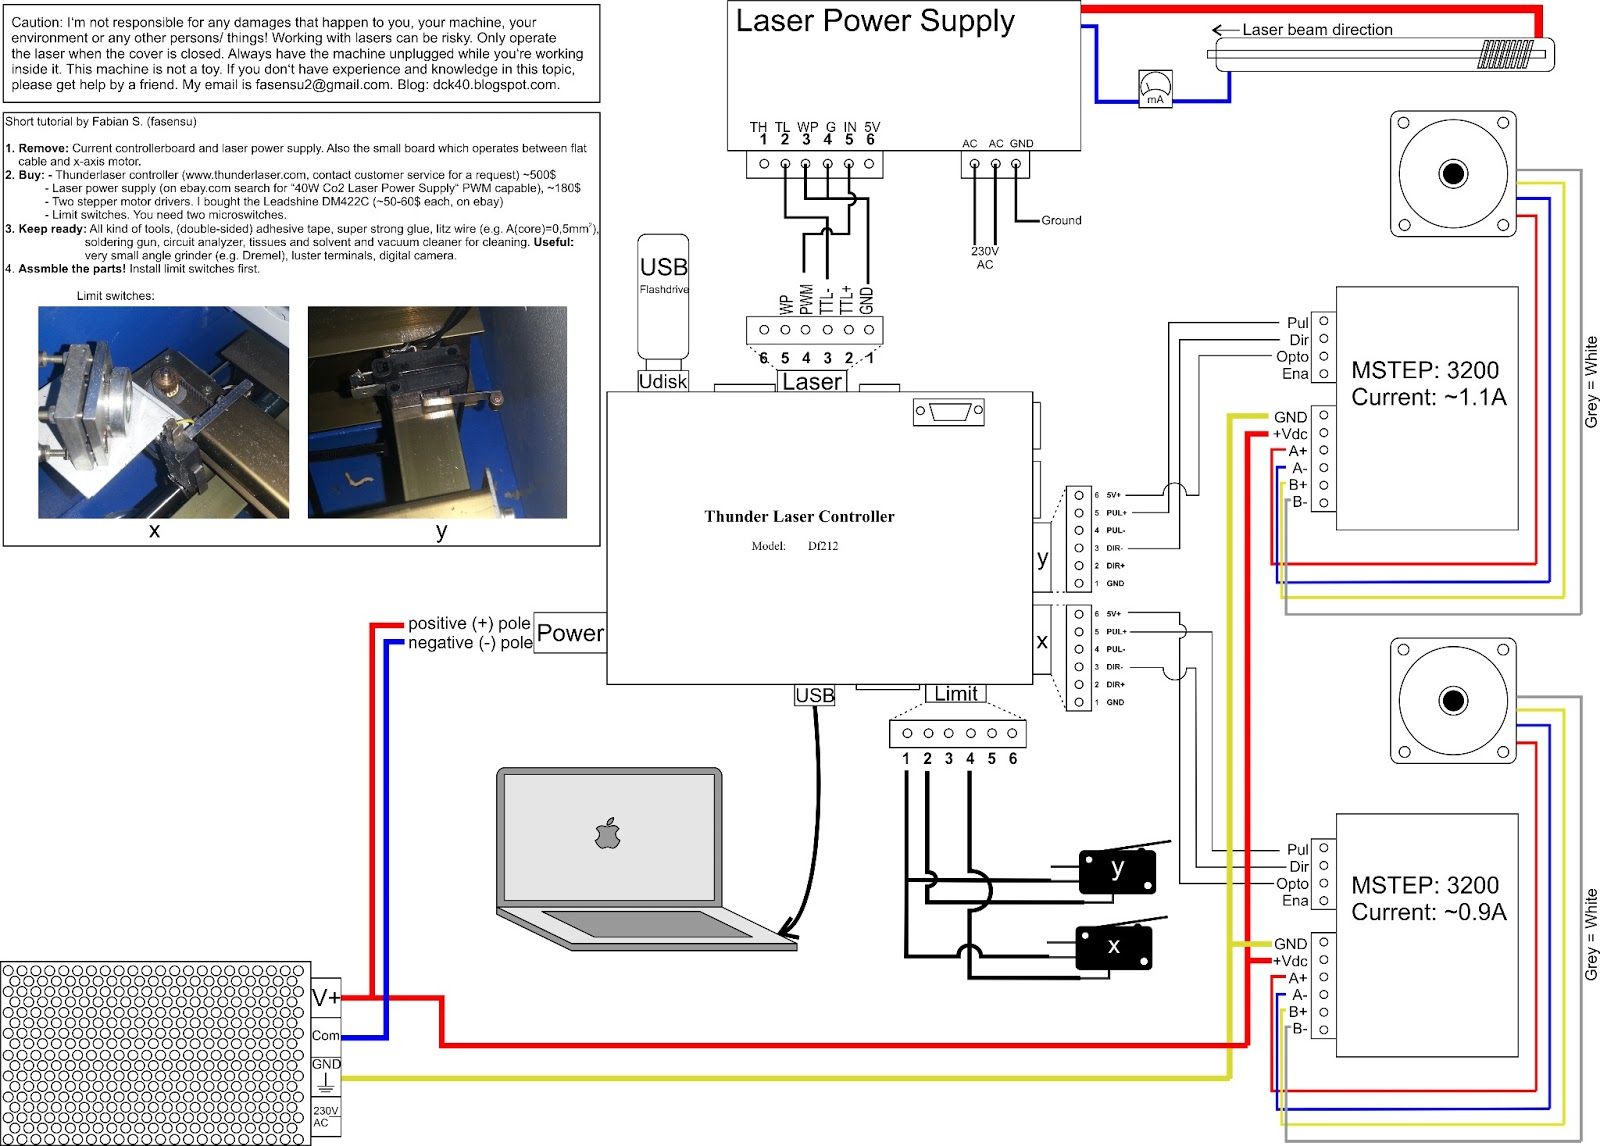 k40 wiring diagram wiring diagram operationsk40 fuse diagram wiring diagram show k40 radar wiring diagram k40 [ 1600 x 1146 Pixel ]